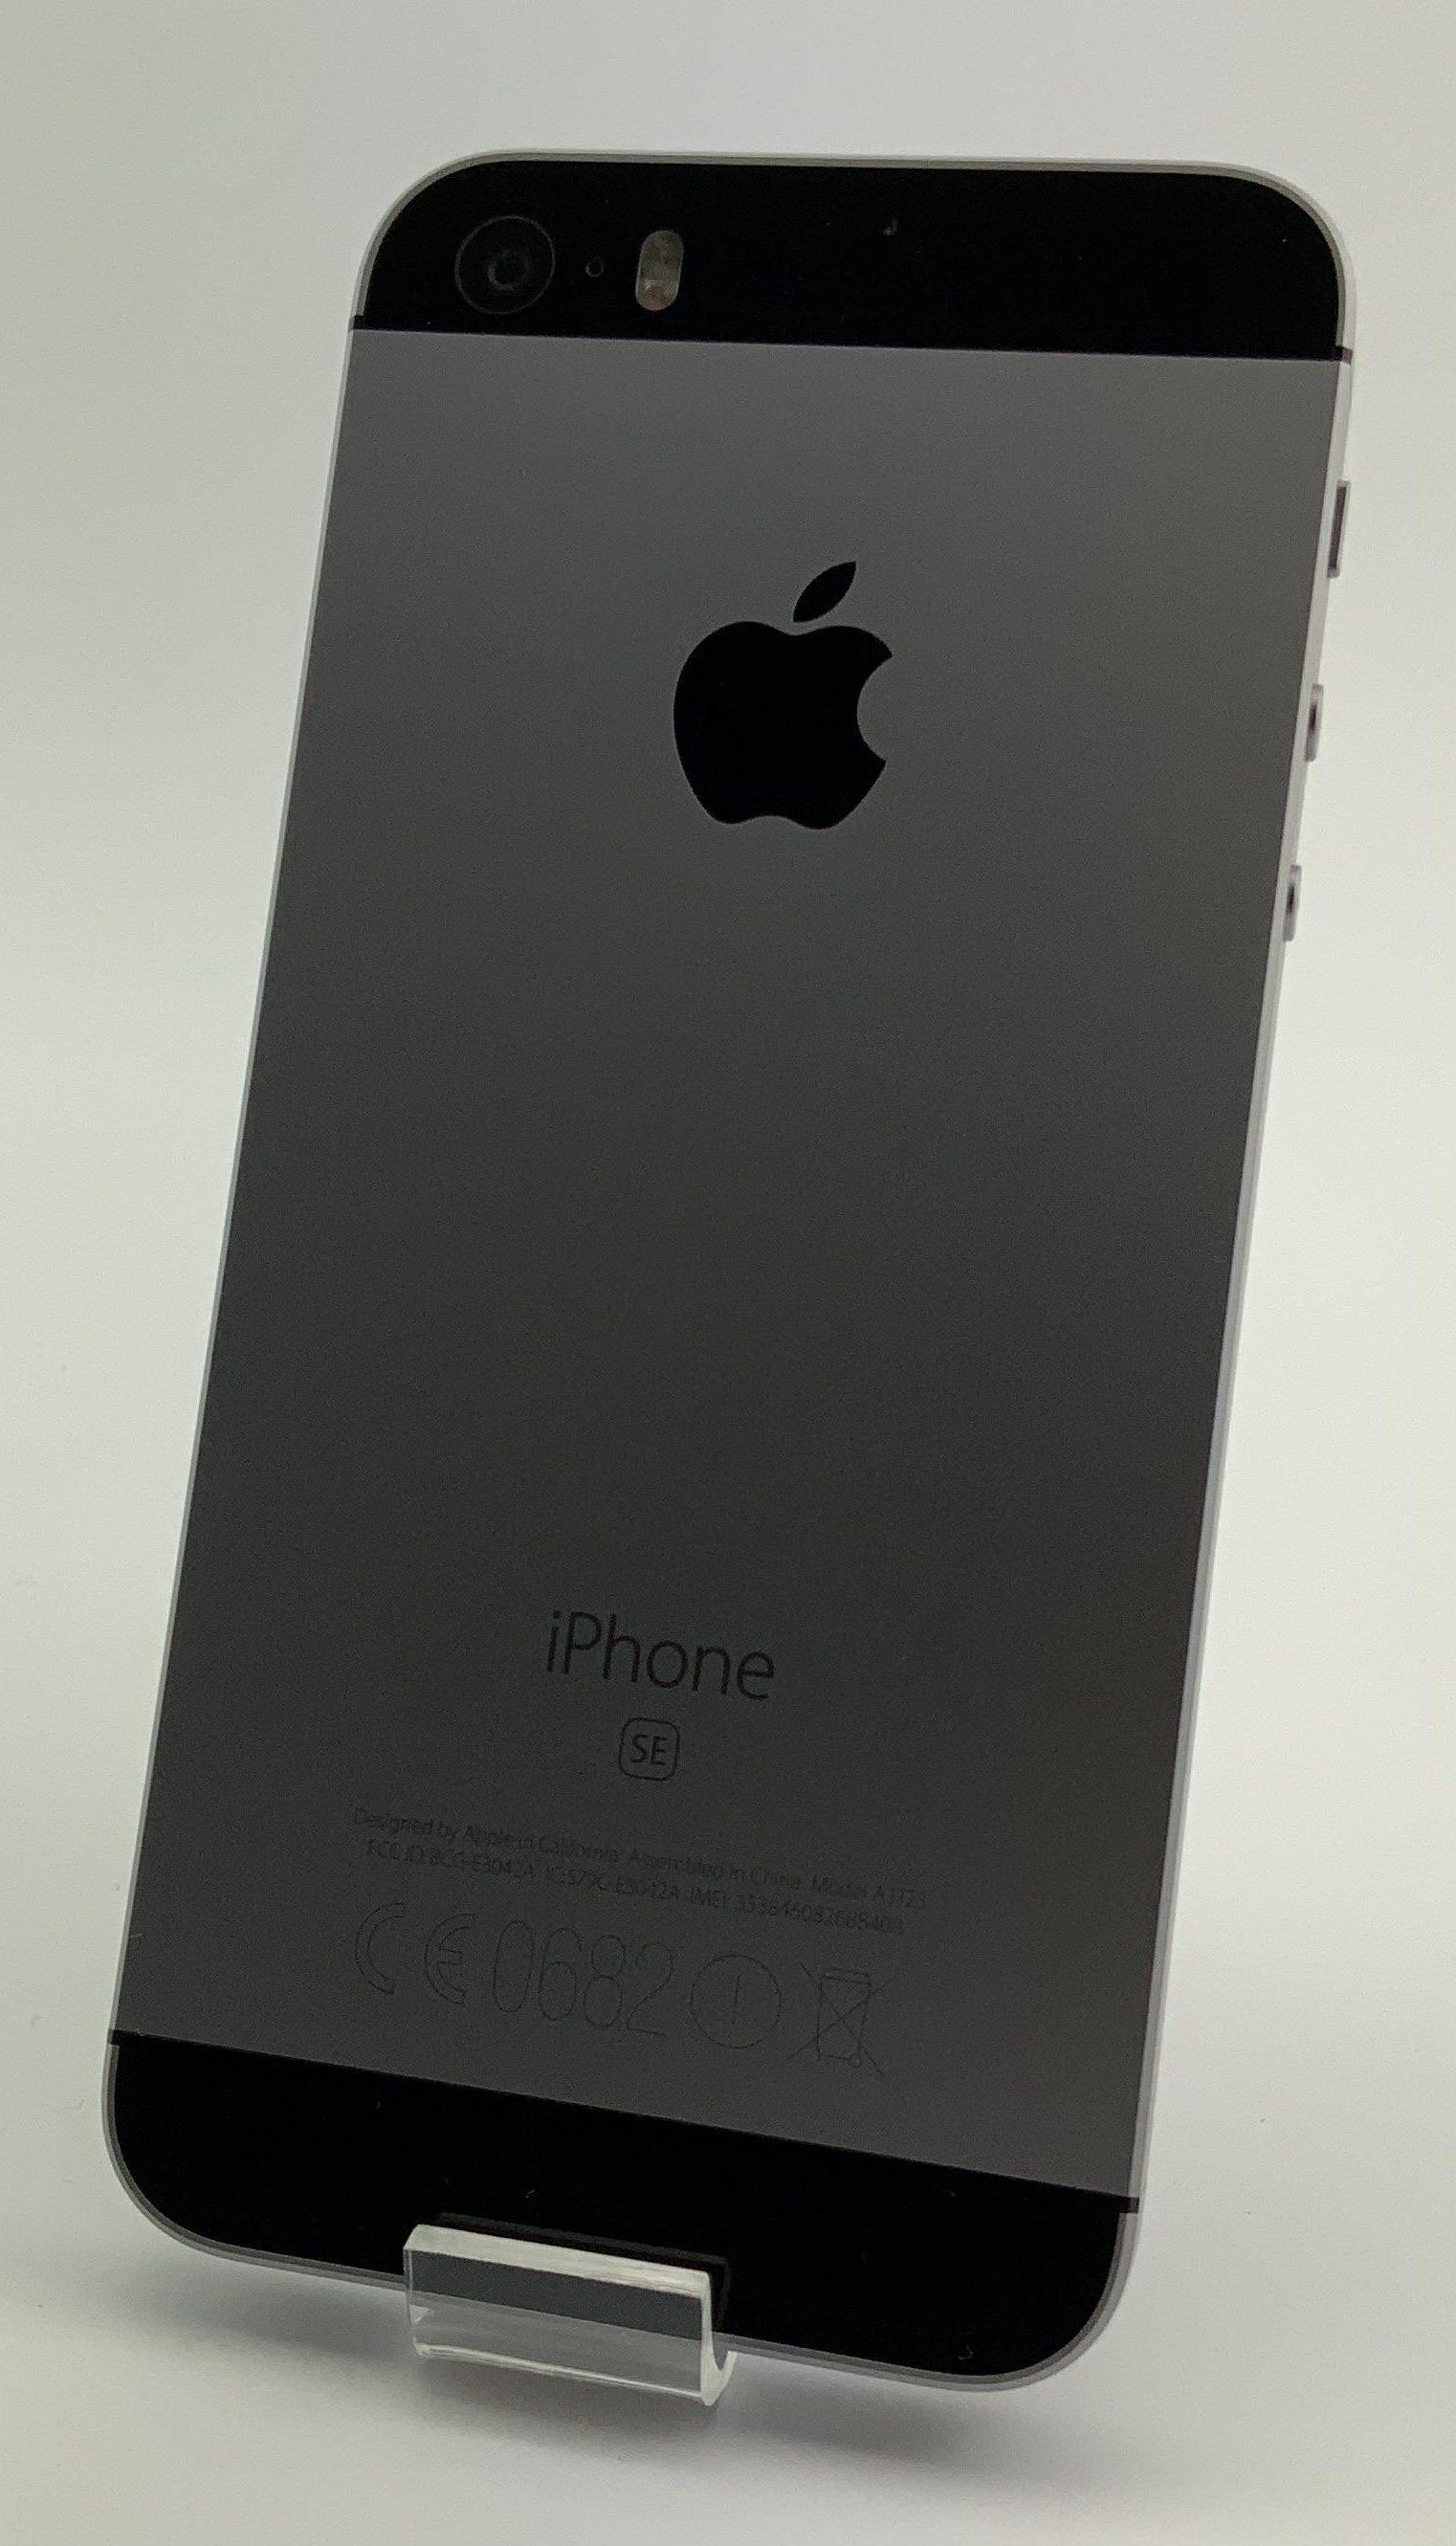 iPhone SE 16GB, 16GB, Space Gray, Afbeelding 2